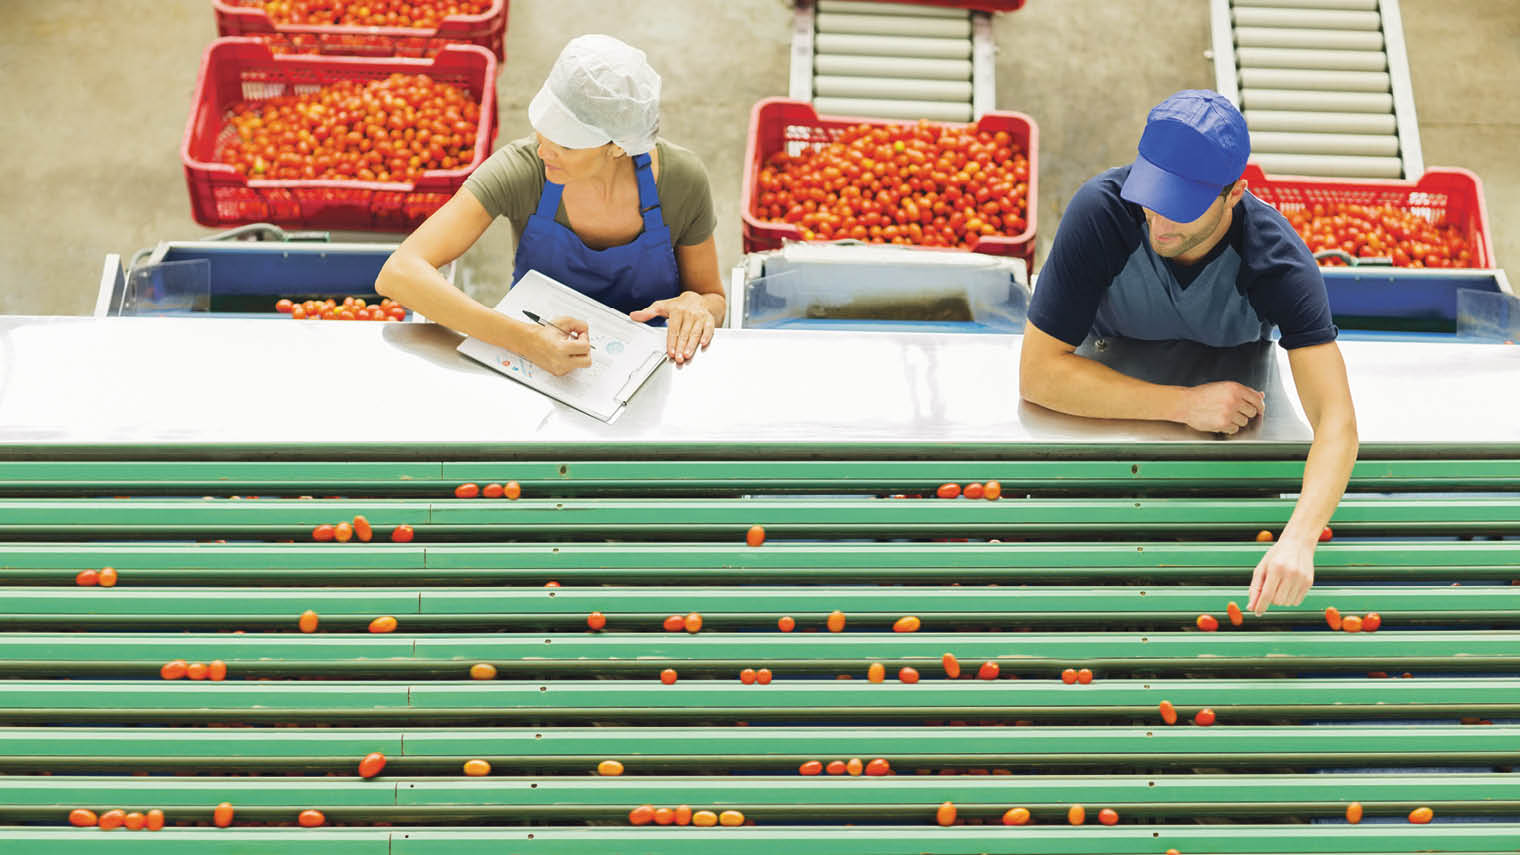 Tech innovation in food industry